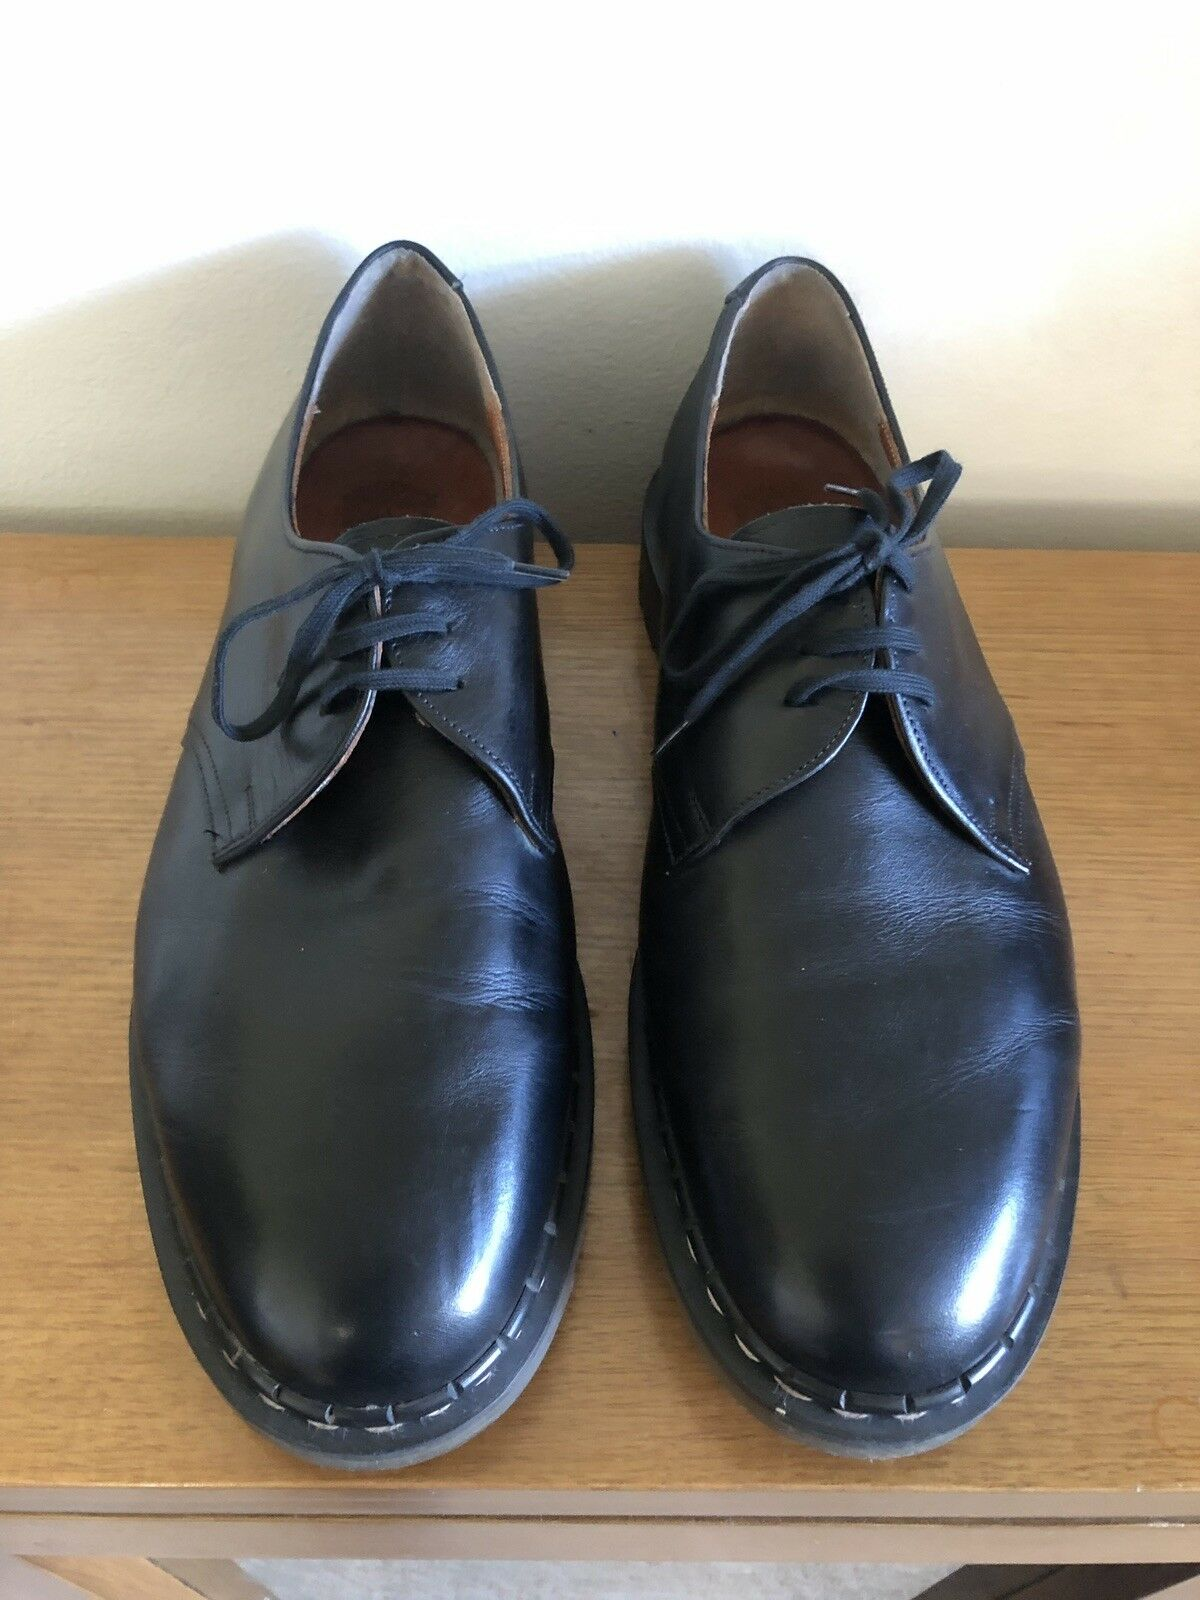 Vintage Tredair - Black shoes - Made in England - Men's Size UK 11 (US12)